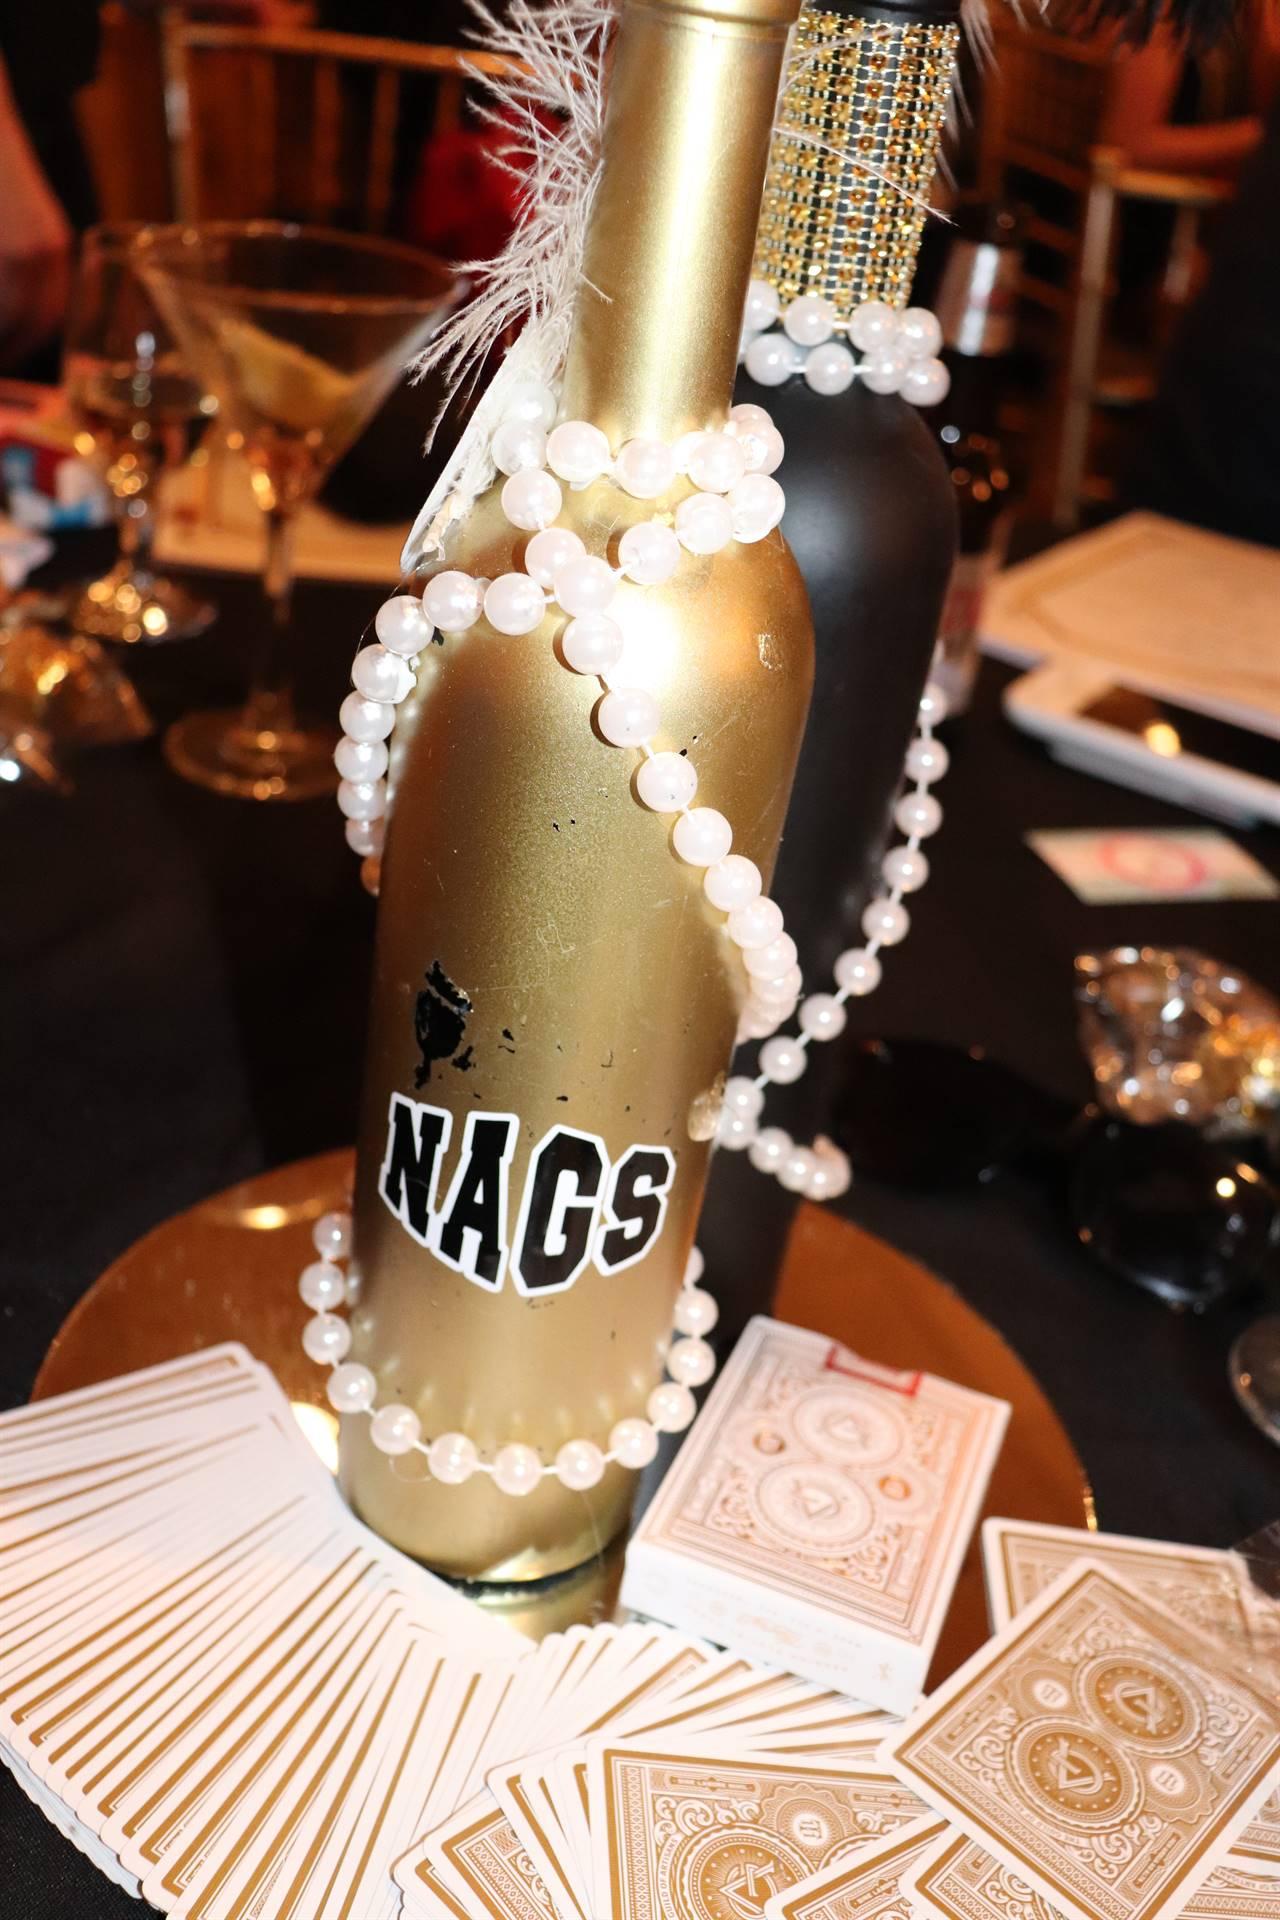 NAGS Roaring Twentieth Auction